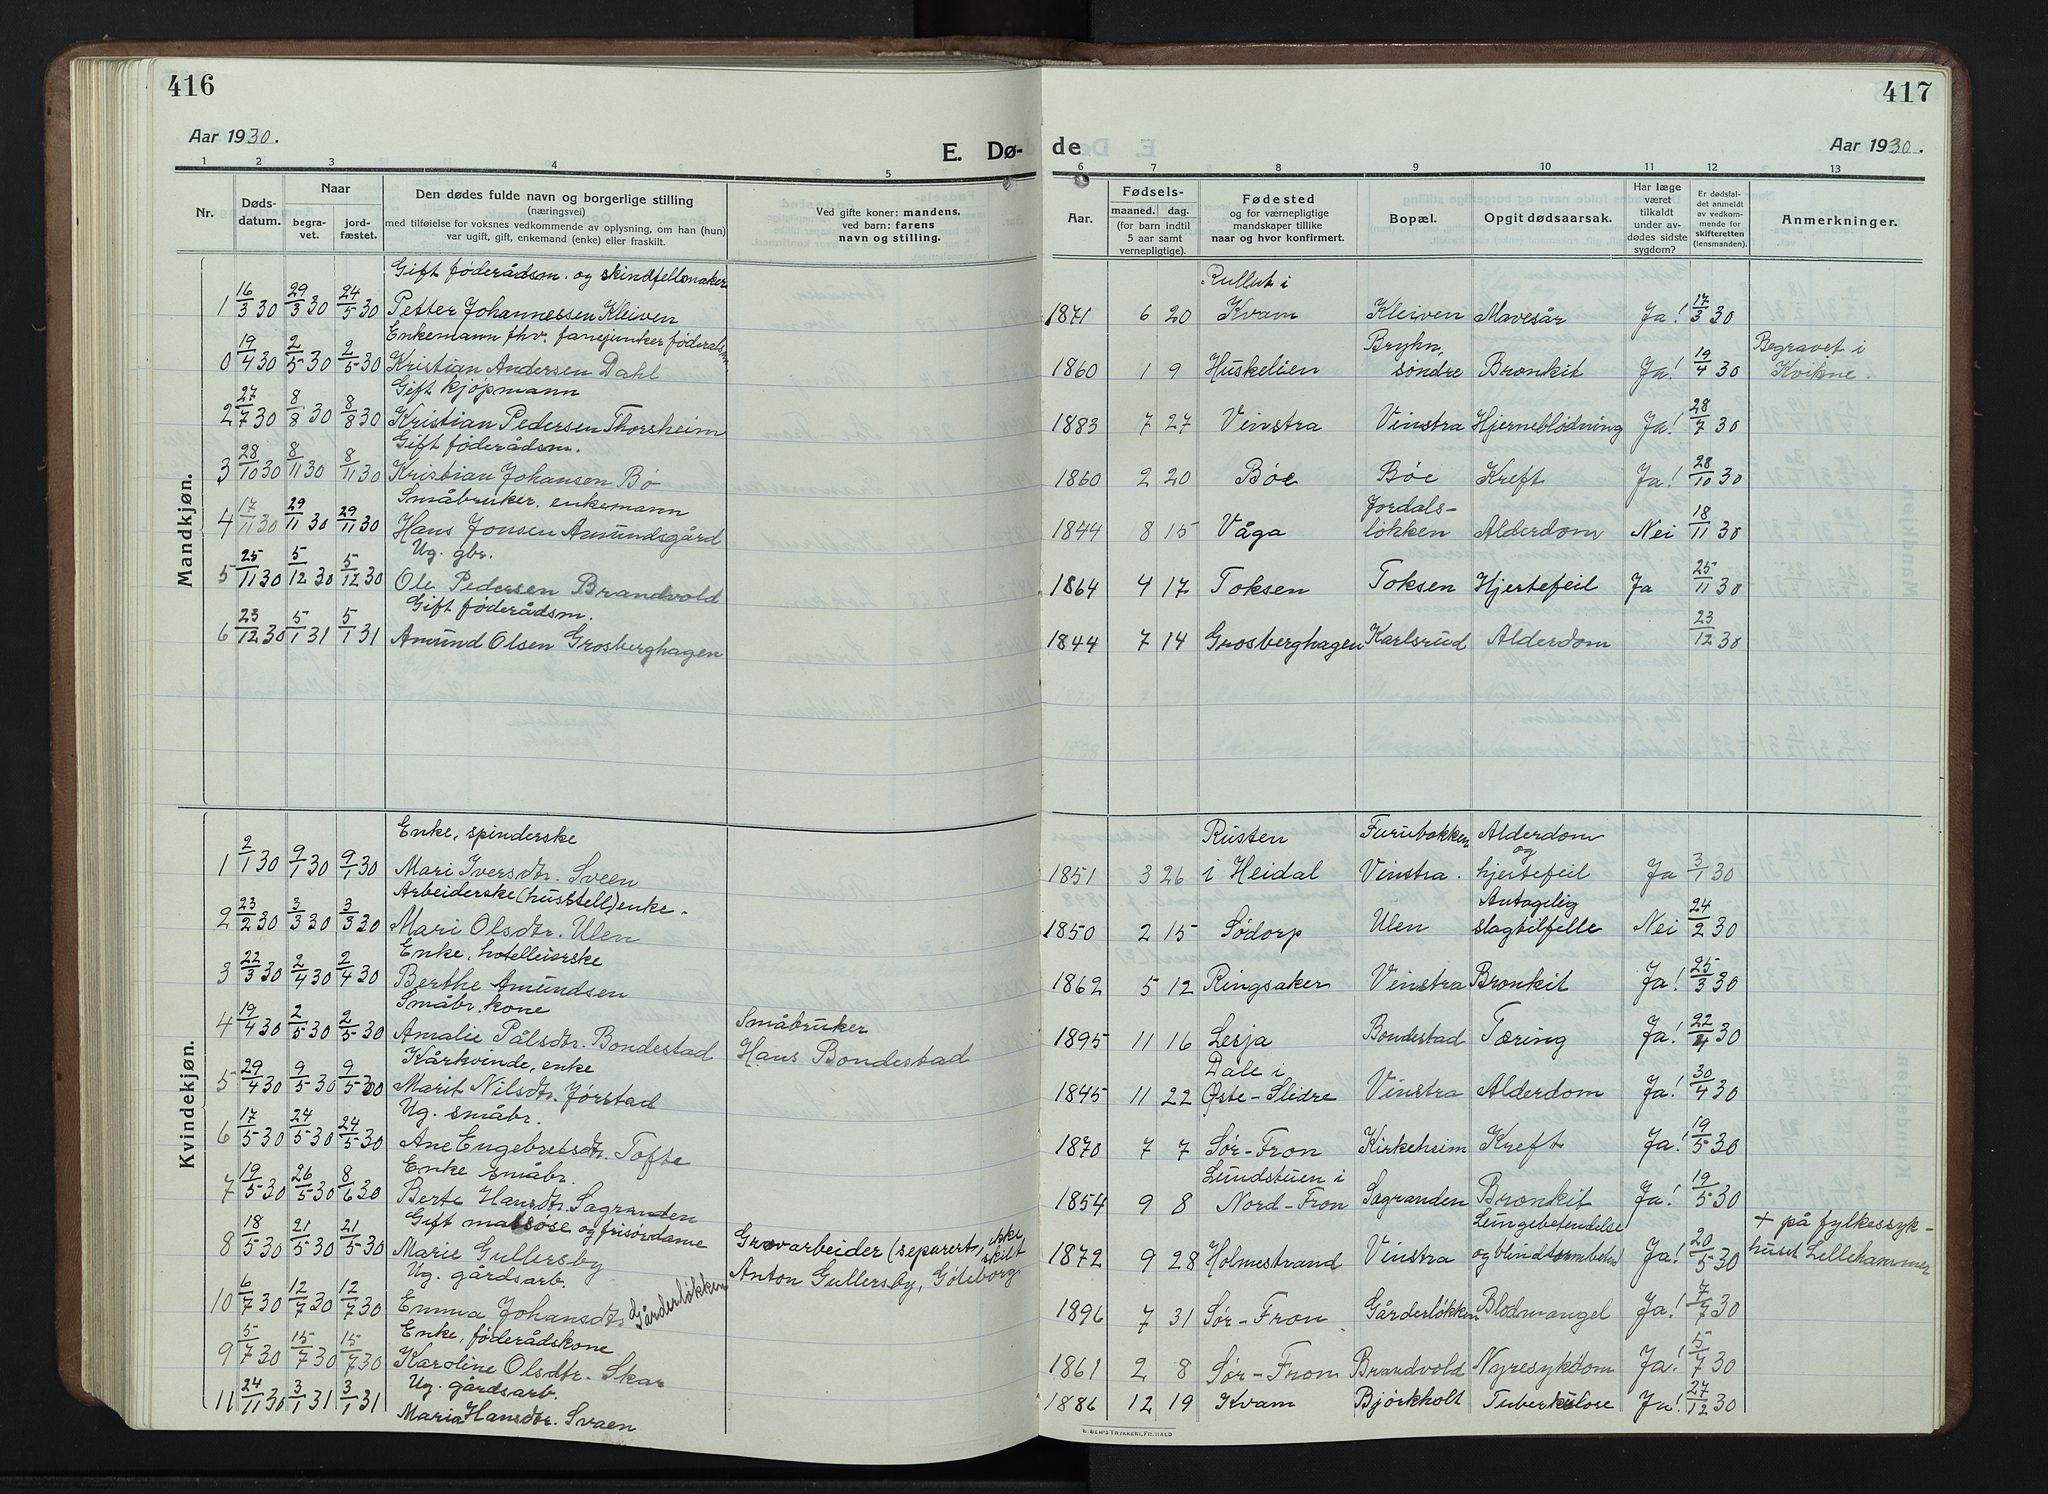 SAH, Nord-Fron prestekontor, Klokkerbok nr. 7, 1915-1946, s. 416-417